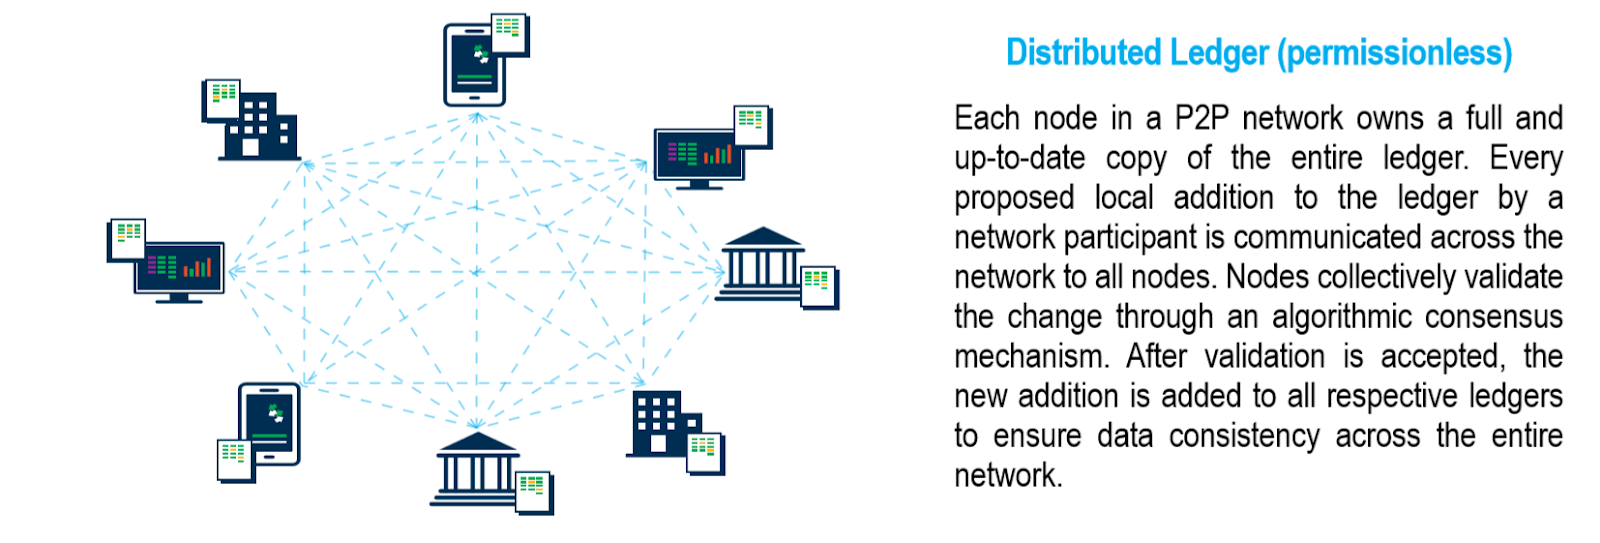 A permissionless blockchain is a public distributed ledger.